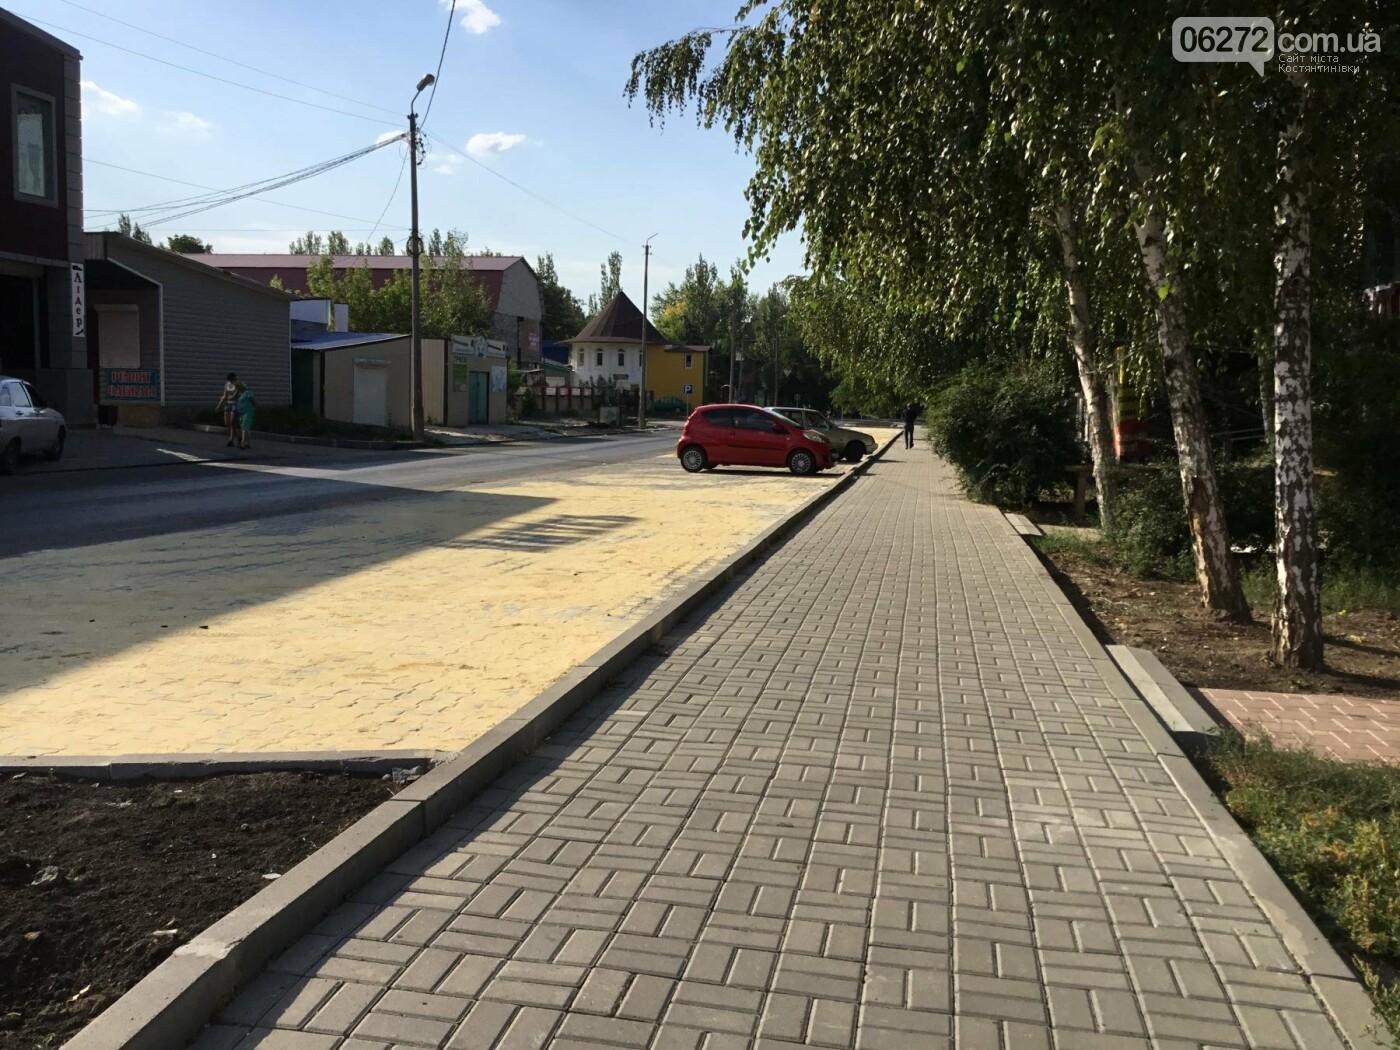 Дорога после ремонта по ул. Леваневского в Константиновке, фото-11